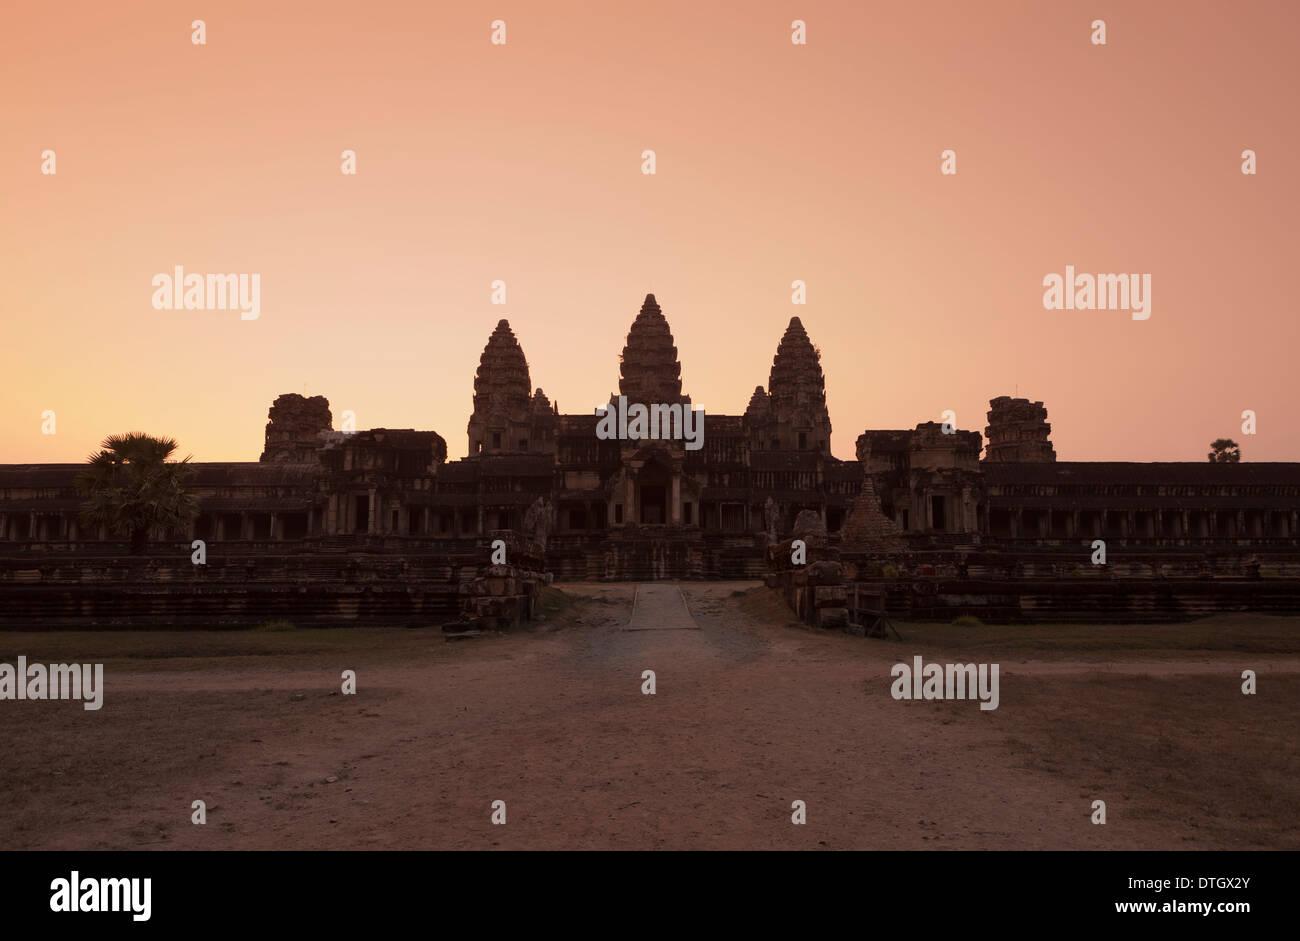 Eastern view of Angkor Wat at dusk, Cambodia - Stock Image